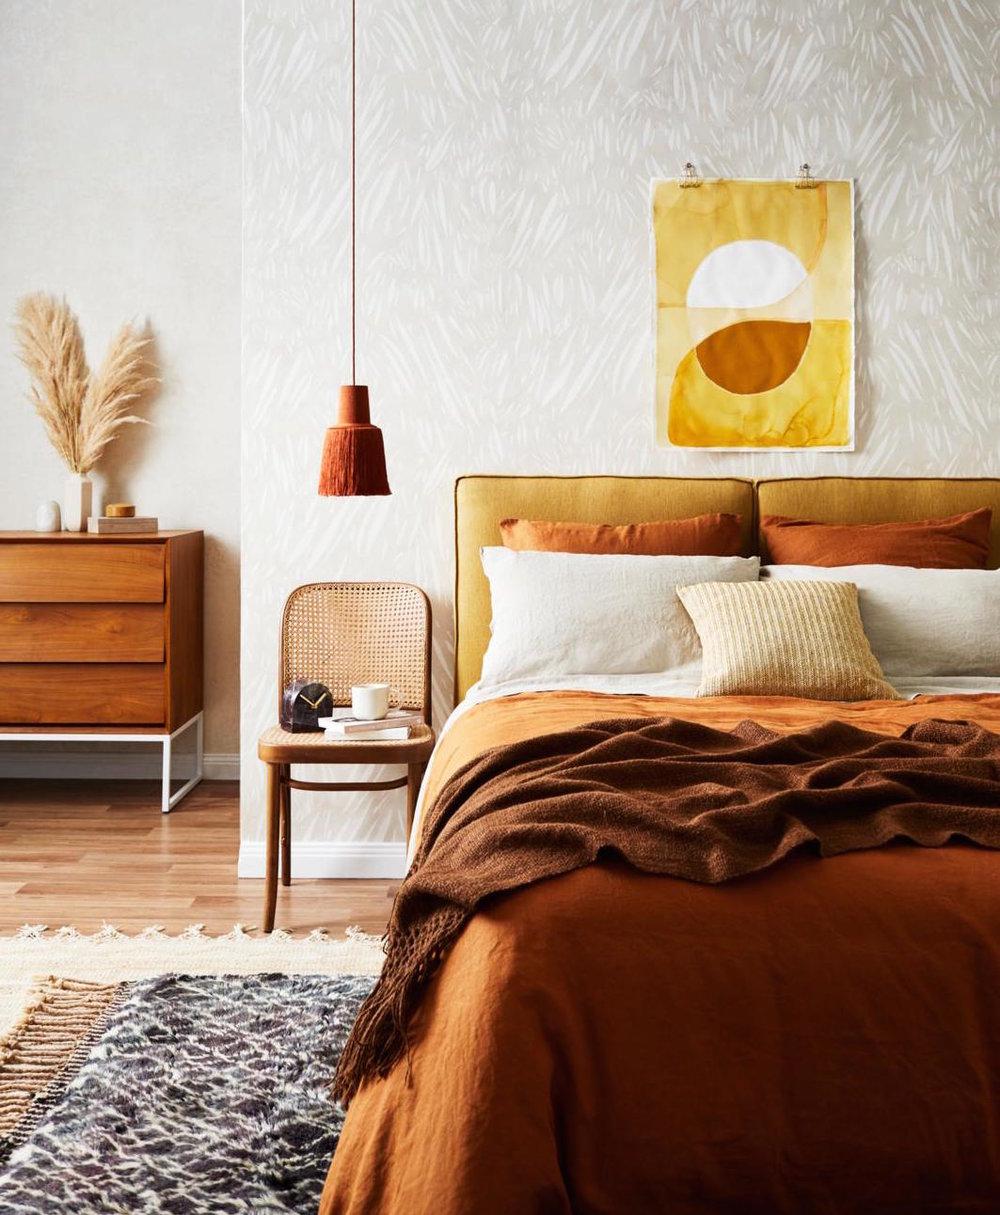 Kerrie-Ann Jones Bedroom BeddingJuly